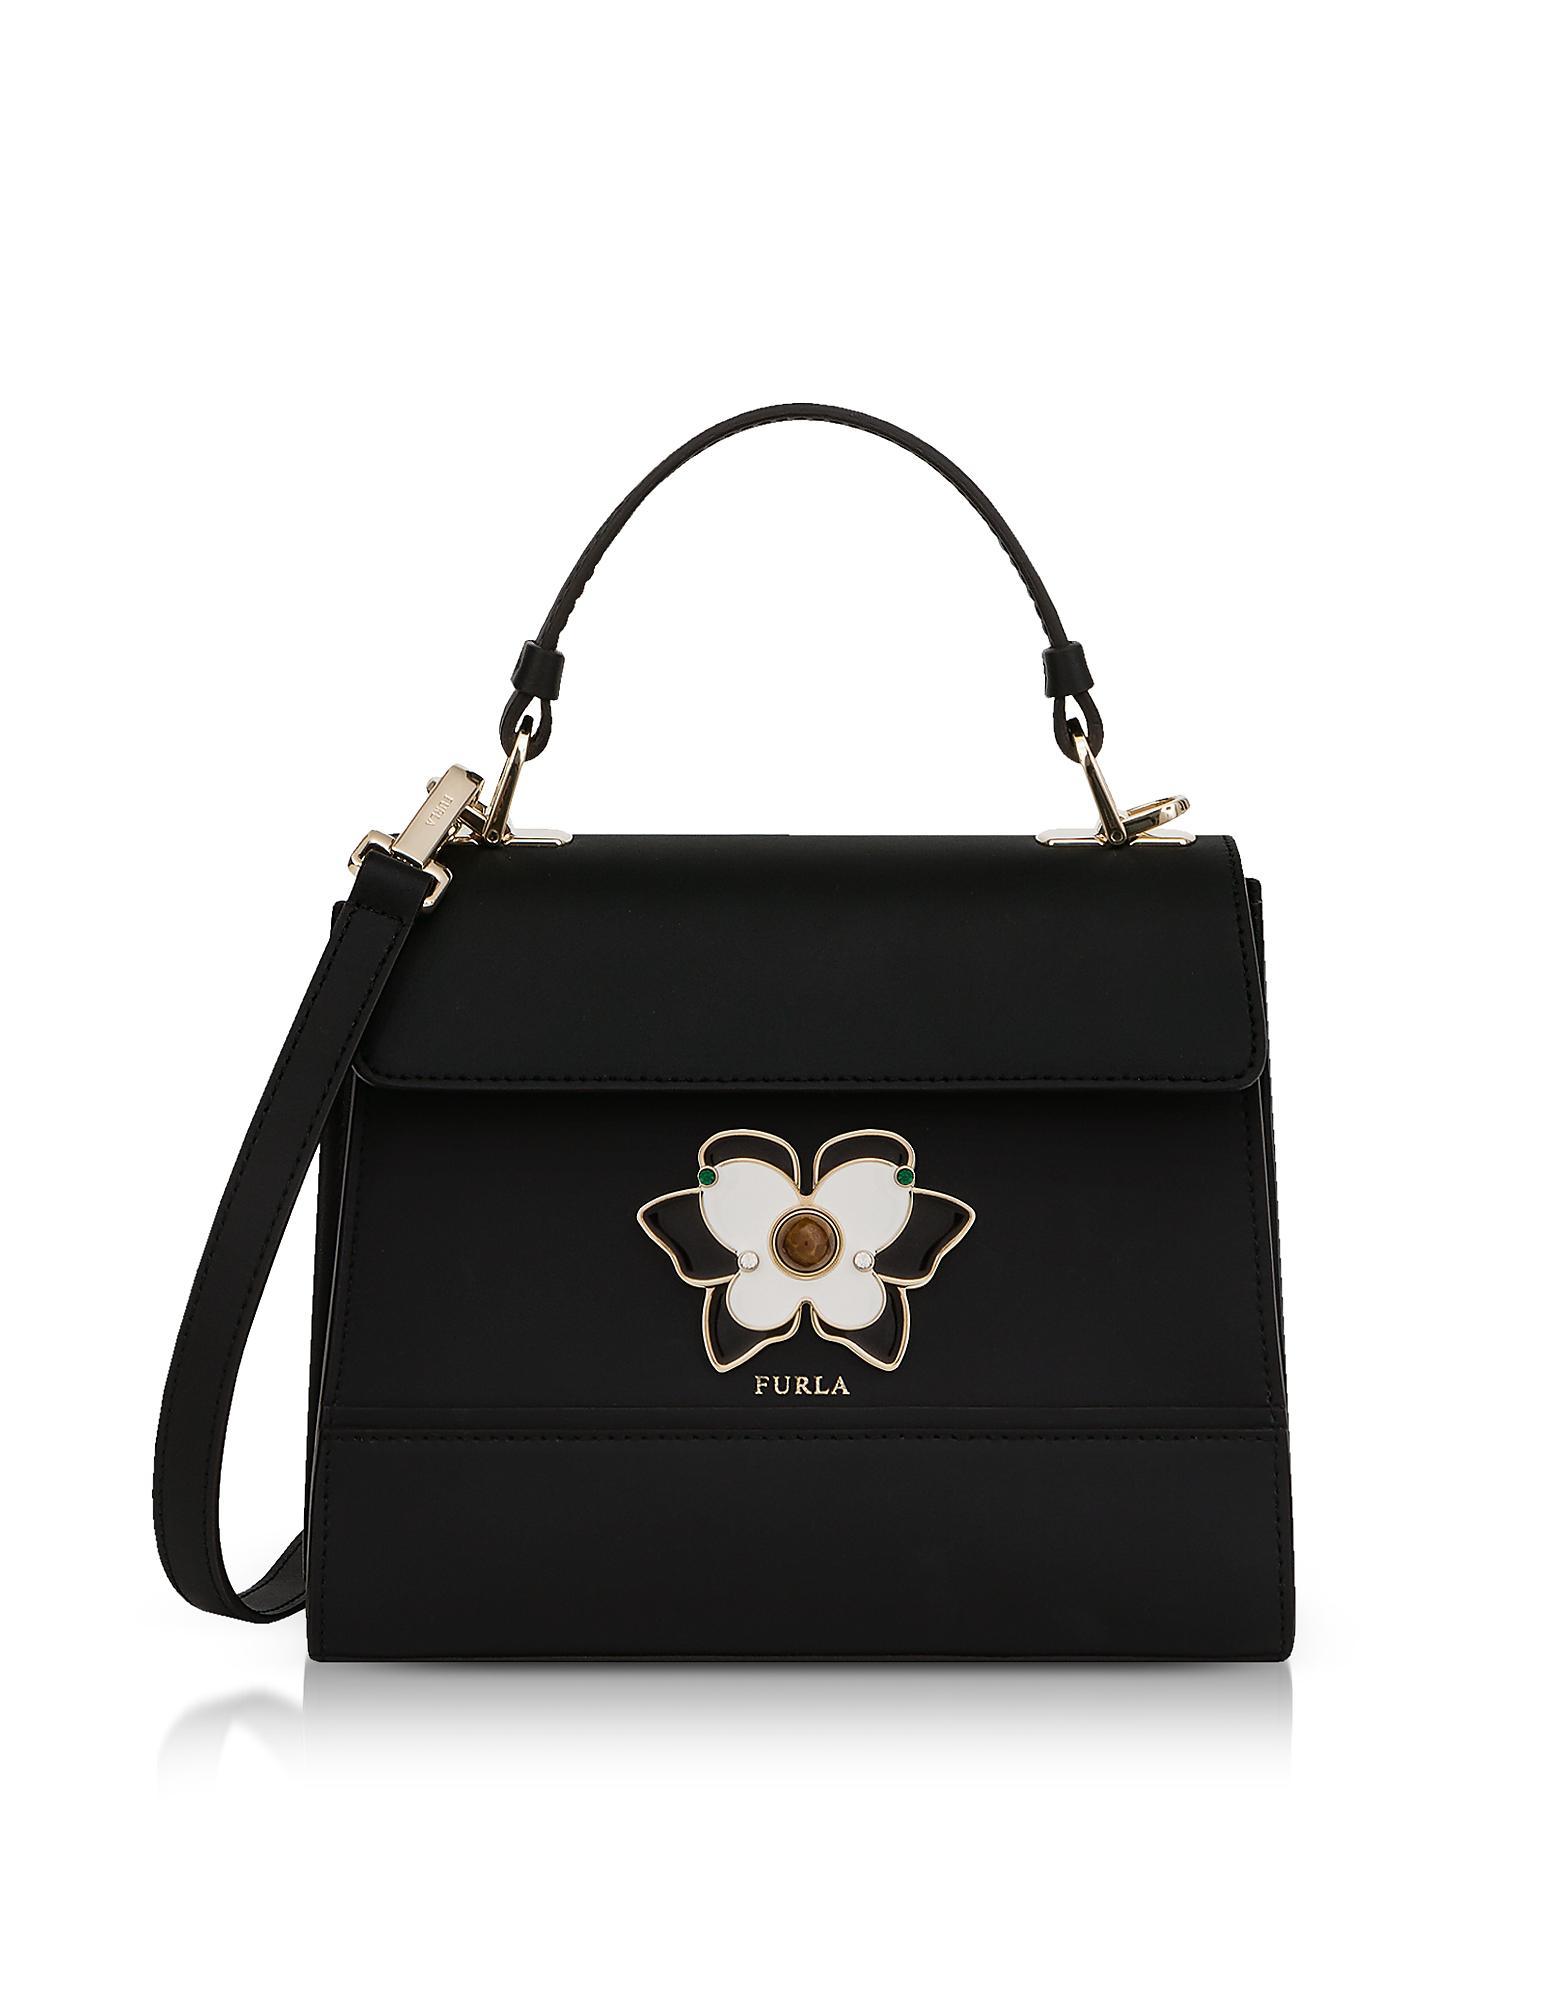 Furla Onyx Mughetto Medium Top Handle Satchel Bag Buy Cheap Sneakernews fjttI8qr